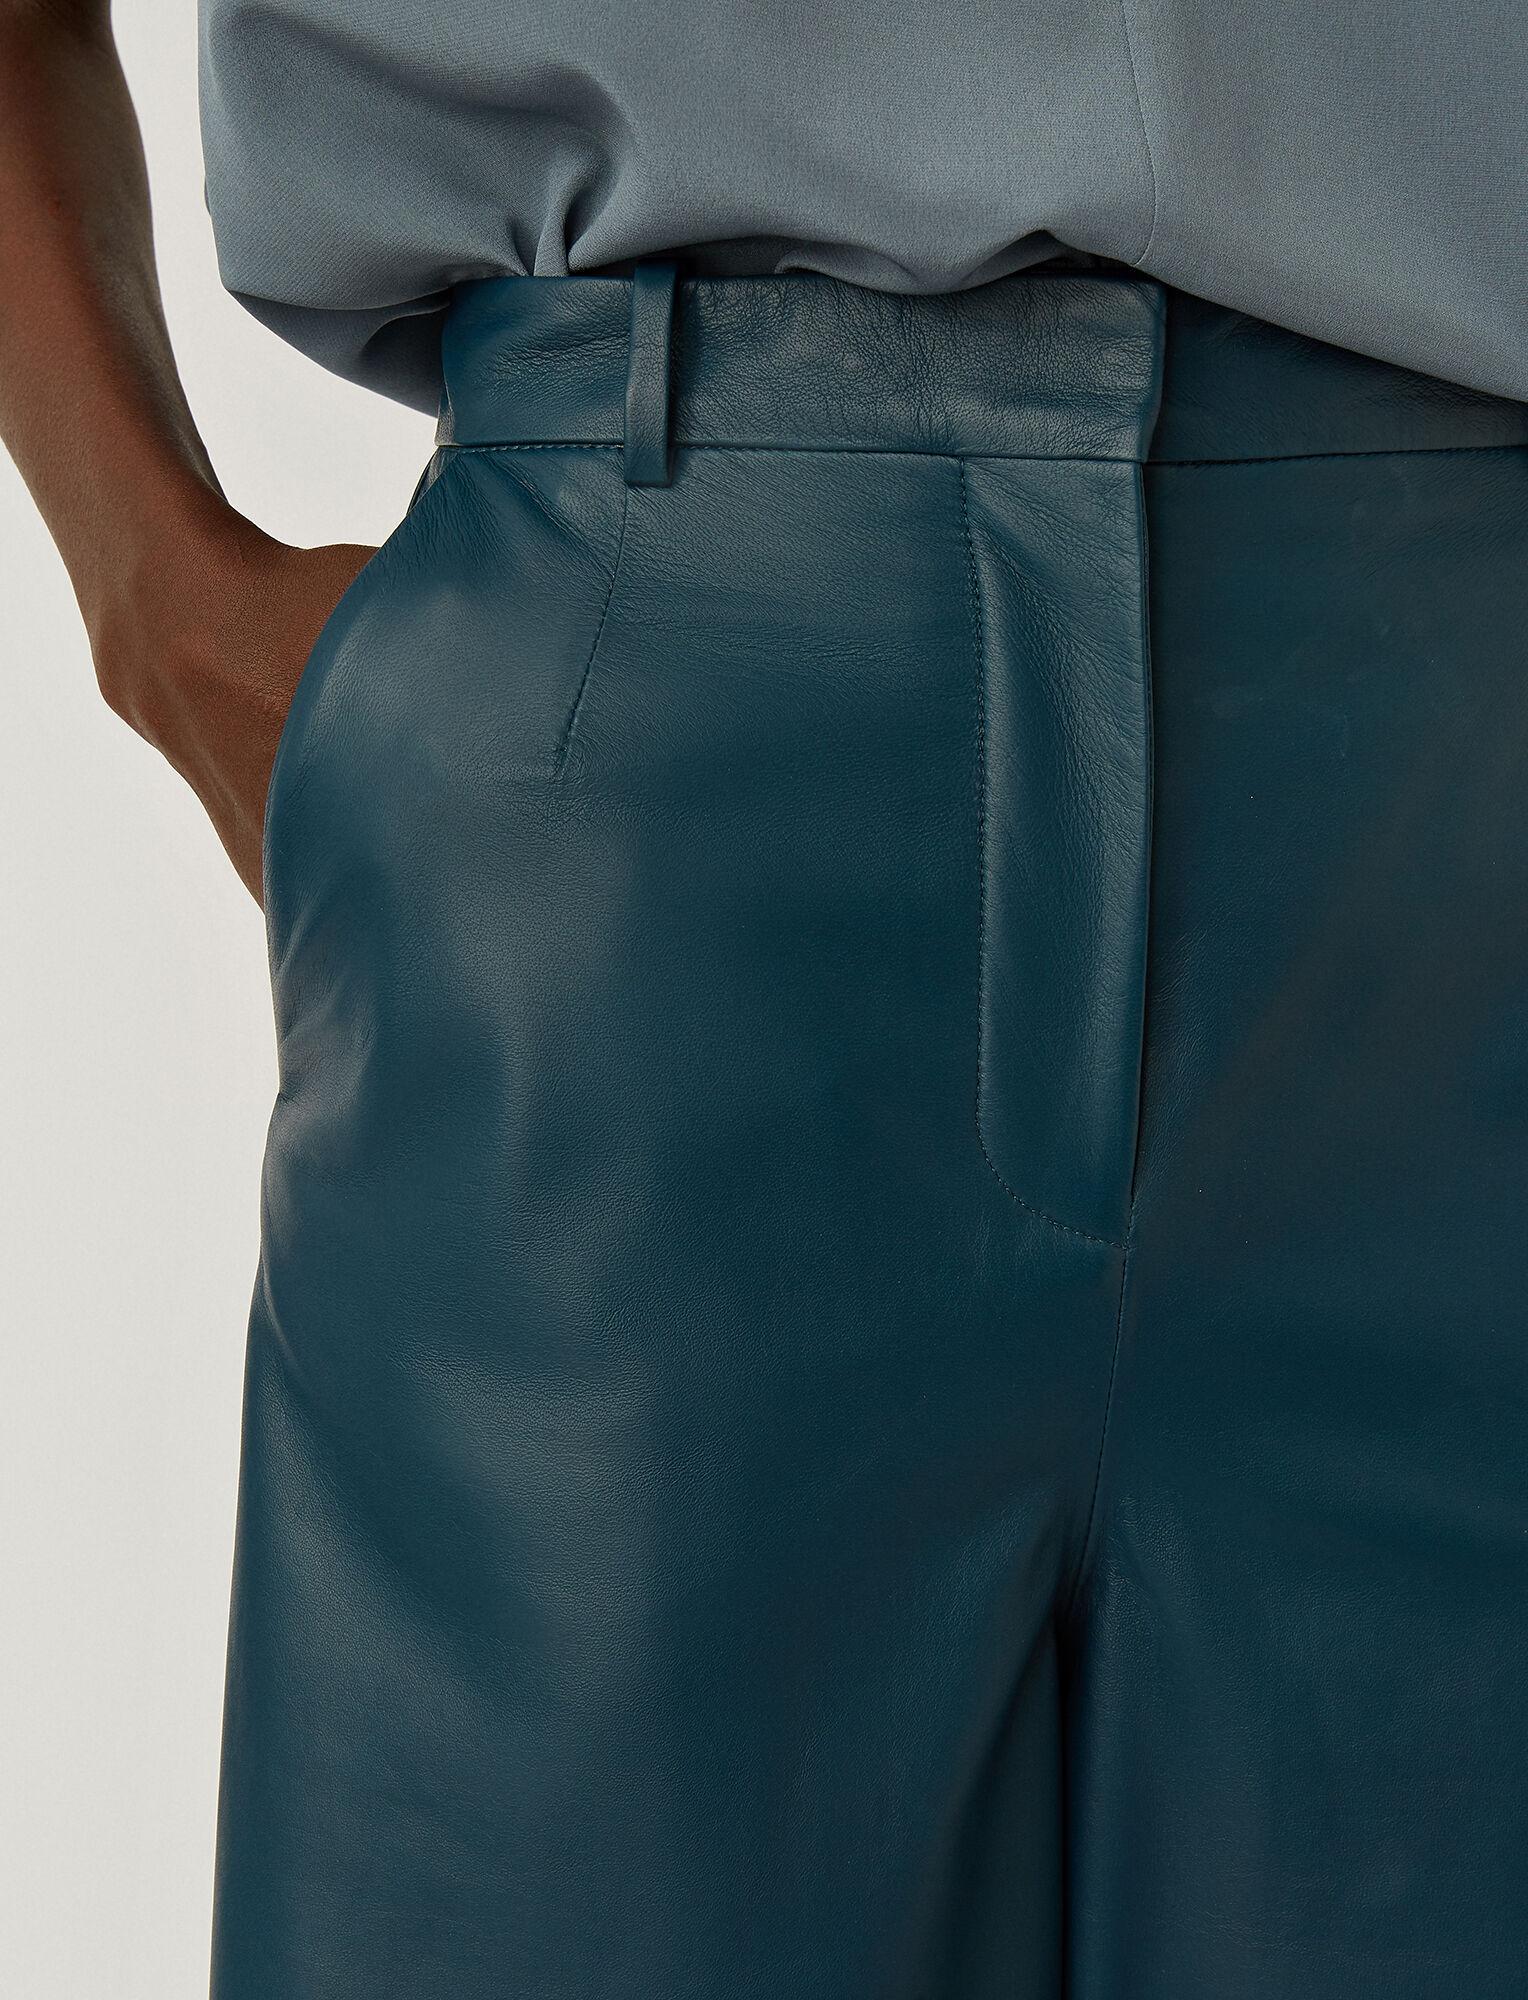 Joseph, Nappa Leather Teresa Shorts, in BLUE STEEL